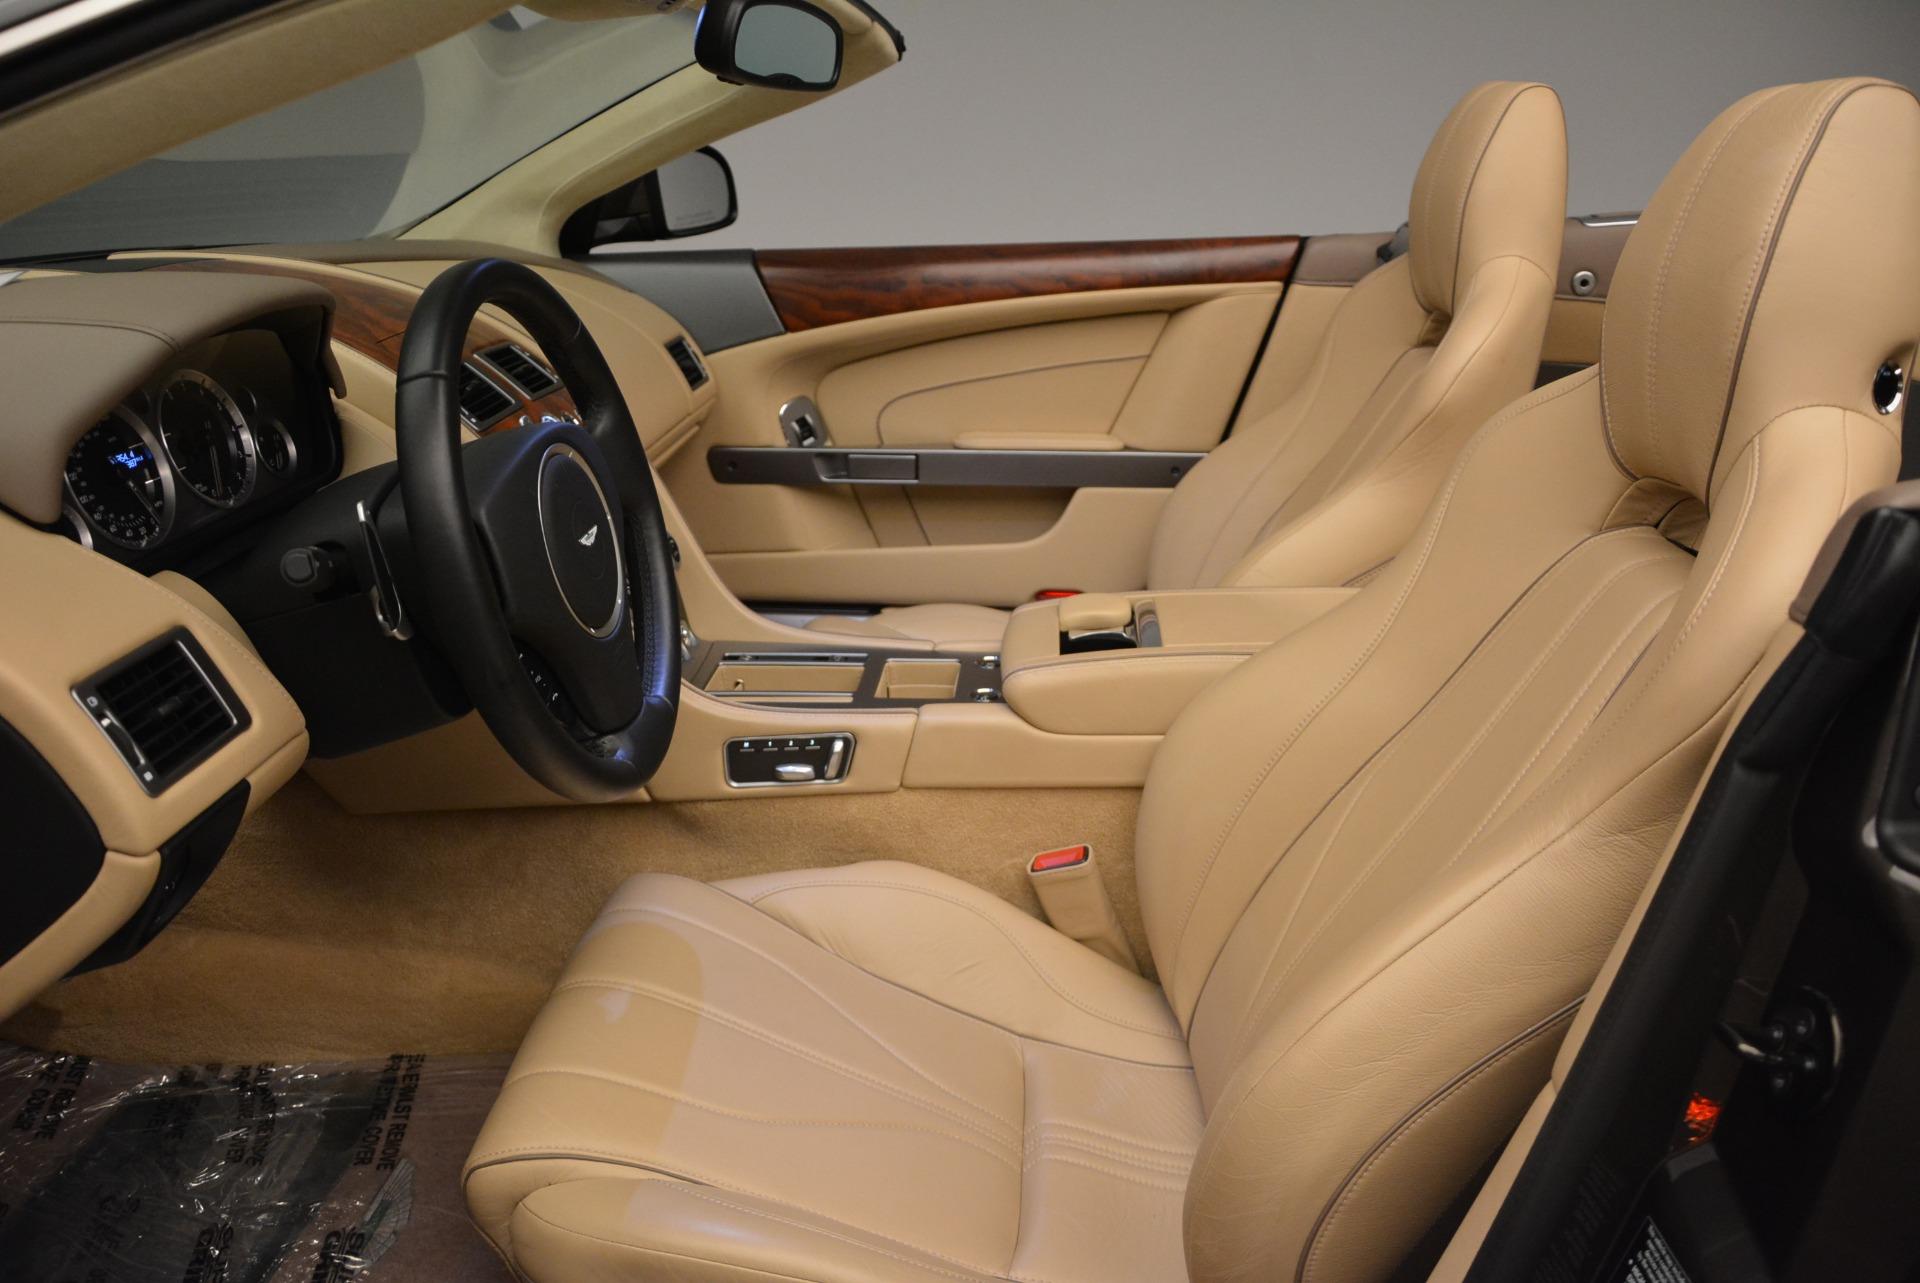 Used 2012 Aston Martin Virage Convertible For Sale In Greenwich, CT. Alfa Romeo of Greenwich, 7613 3351_p21